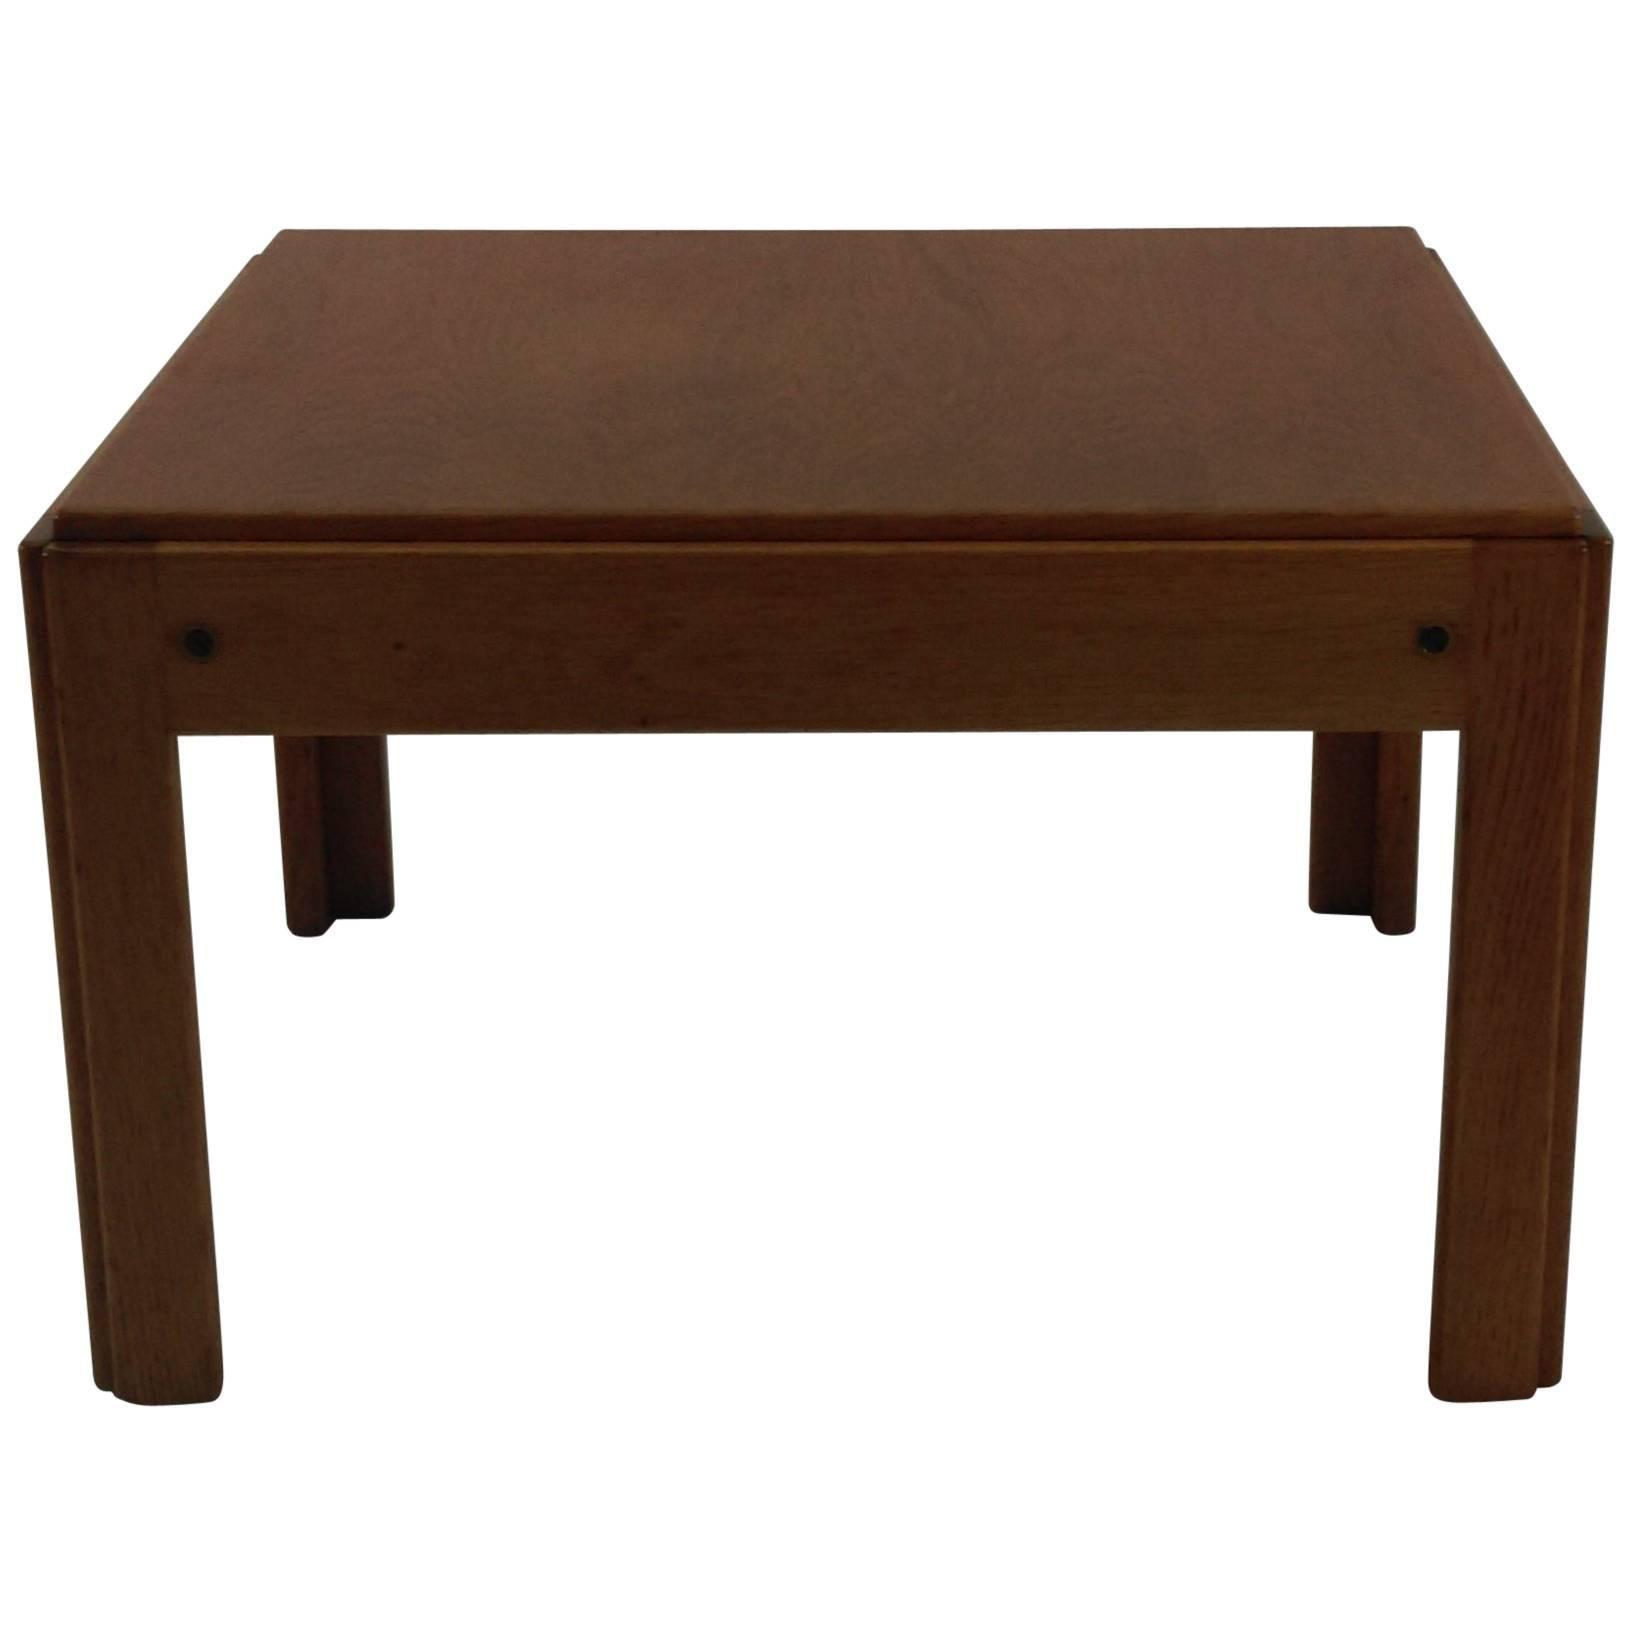 1960s Illum Wikkelso Danish Plexus Side Table by CFC Silkeborg